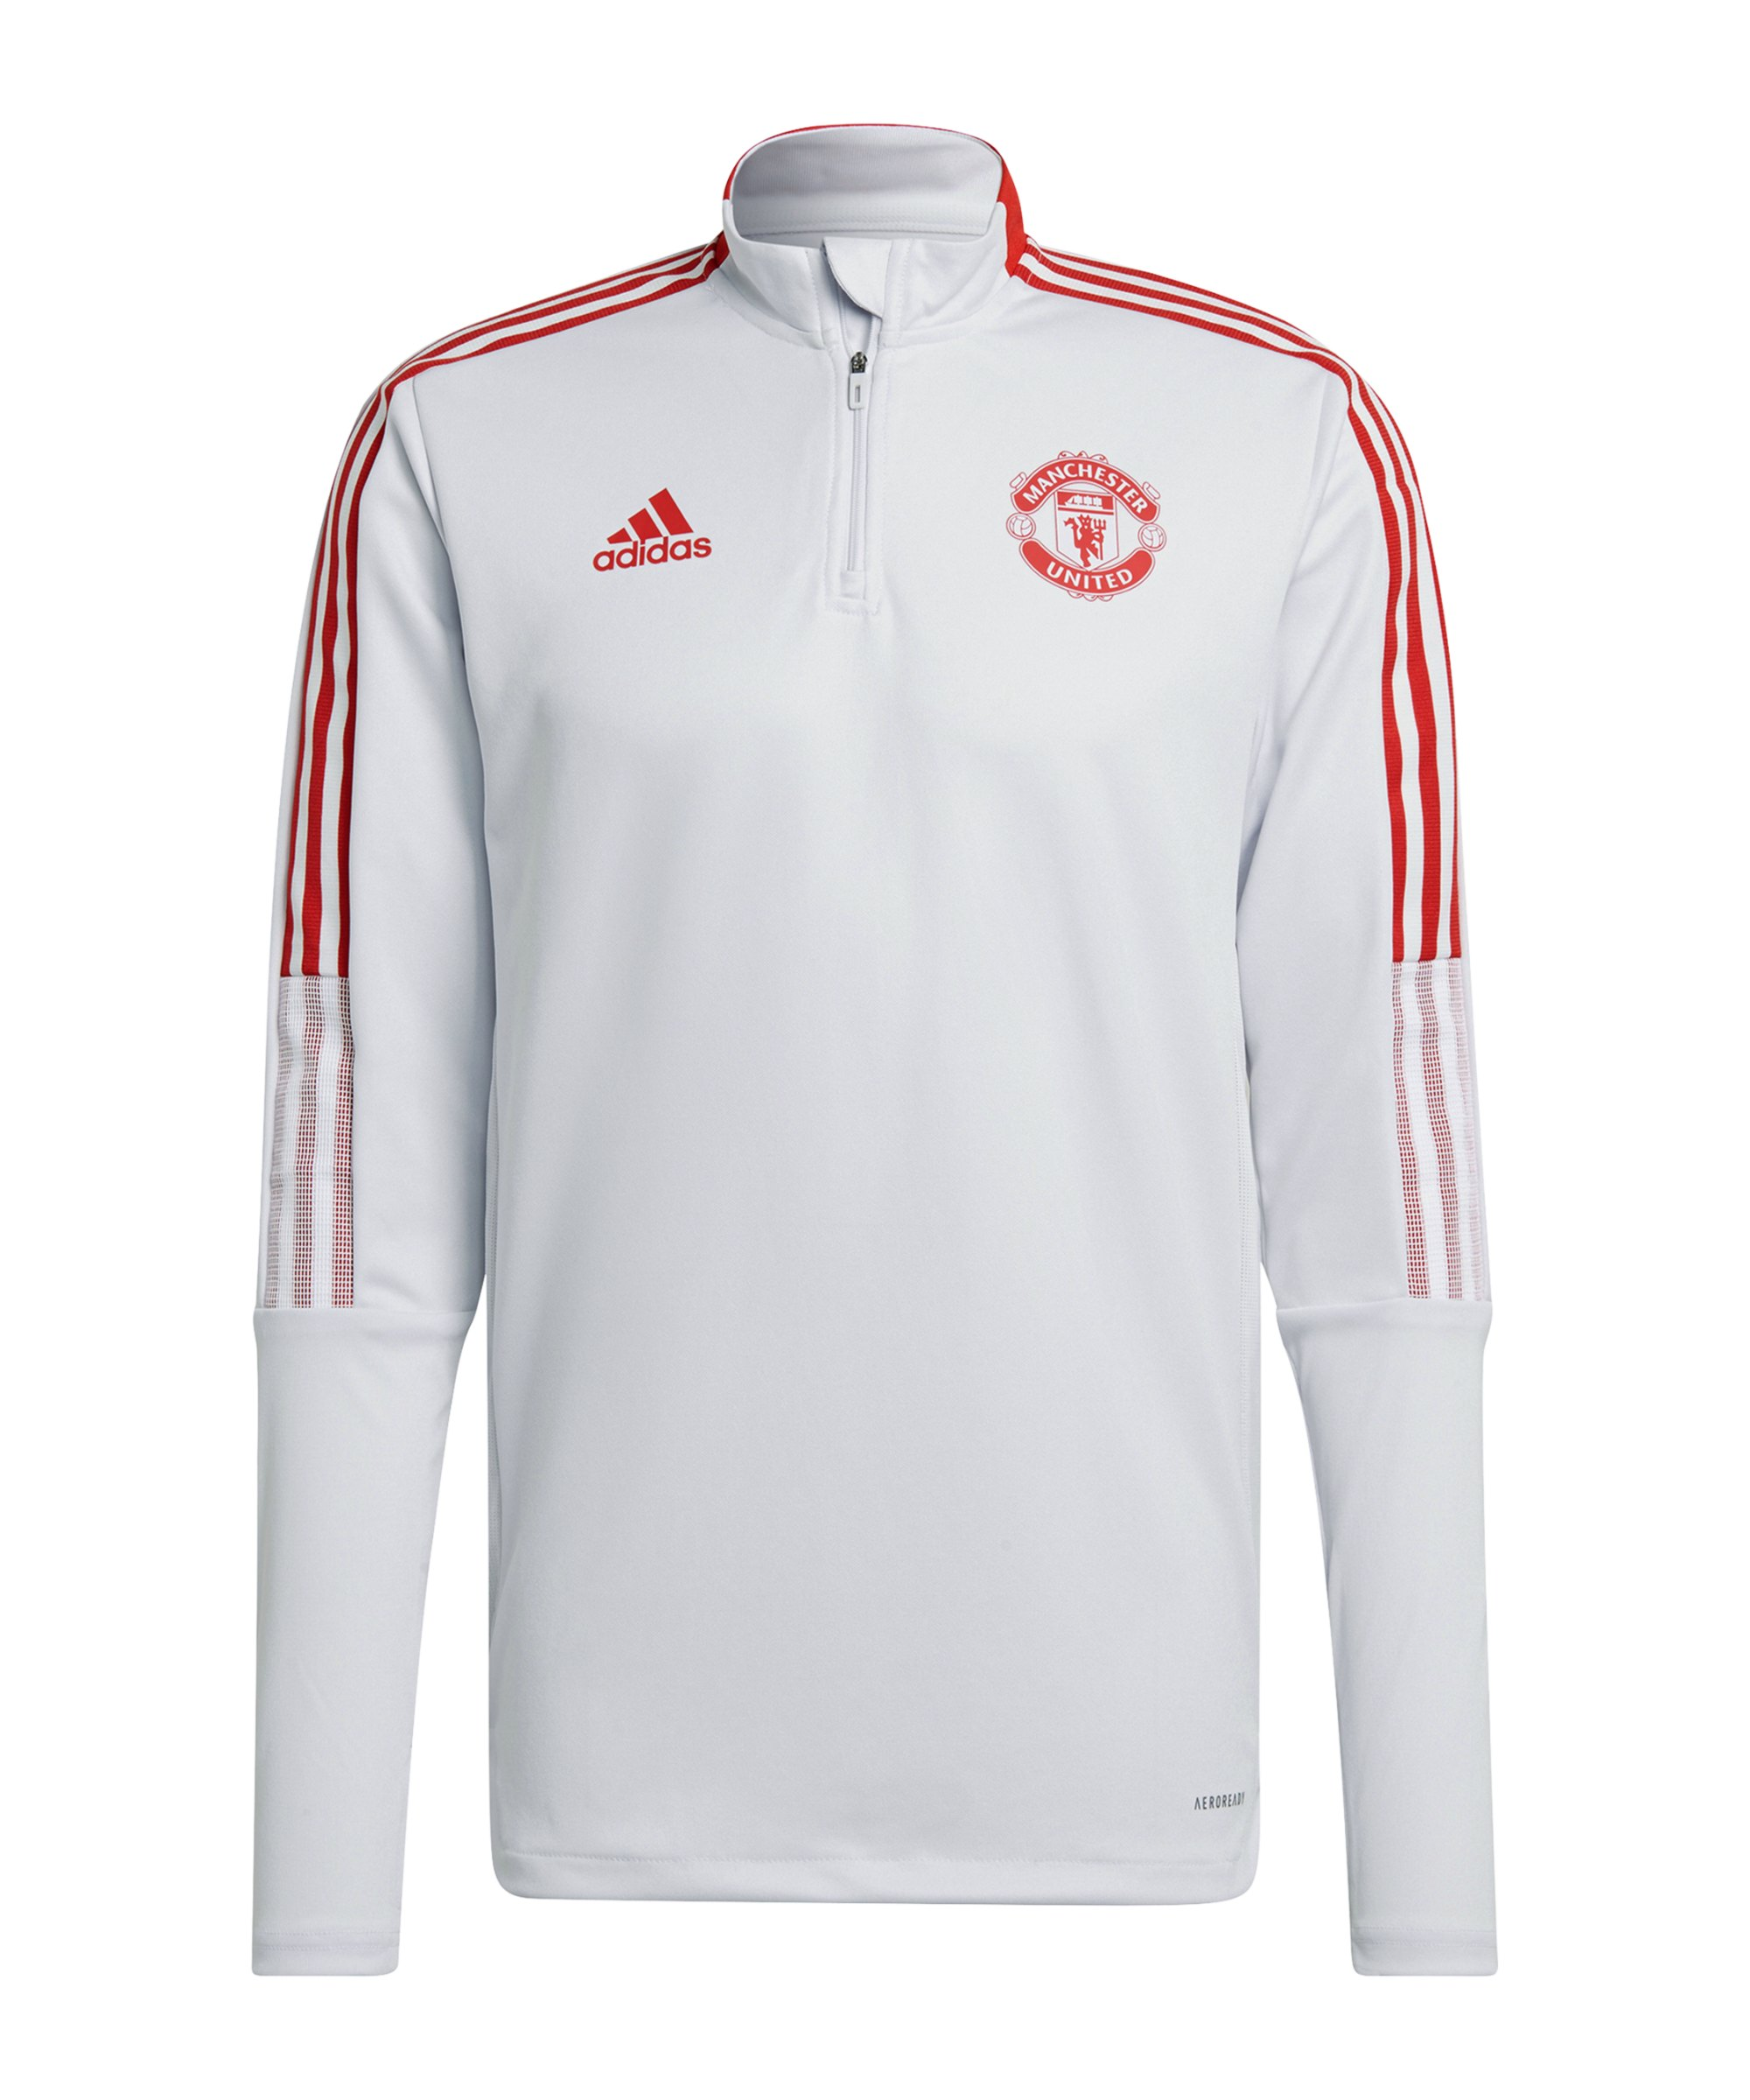 adidas Manchester United HalfZip Sweatshirt Grau - grau